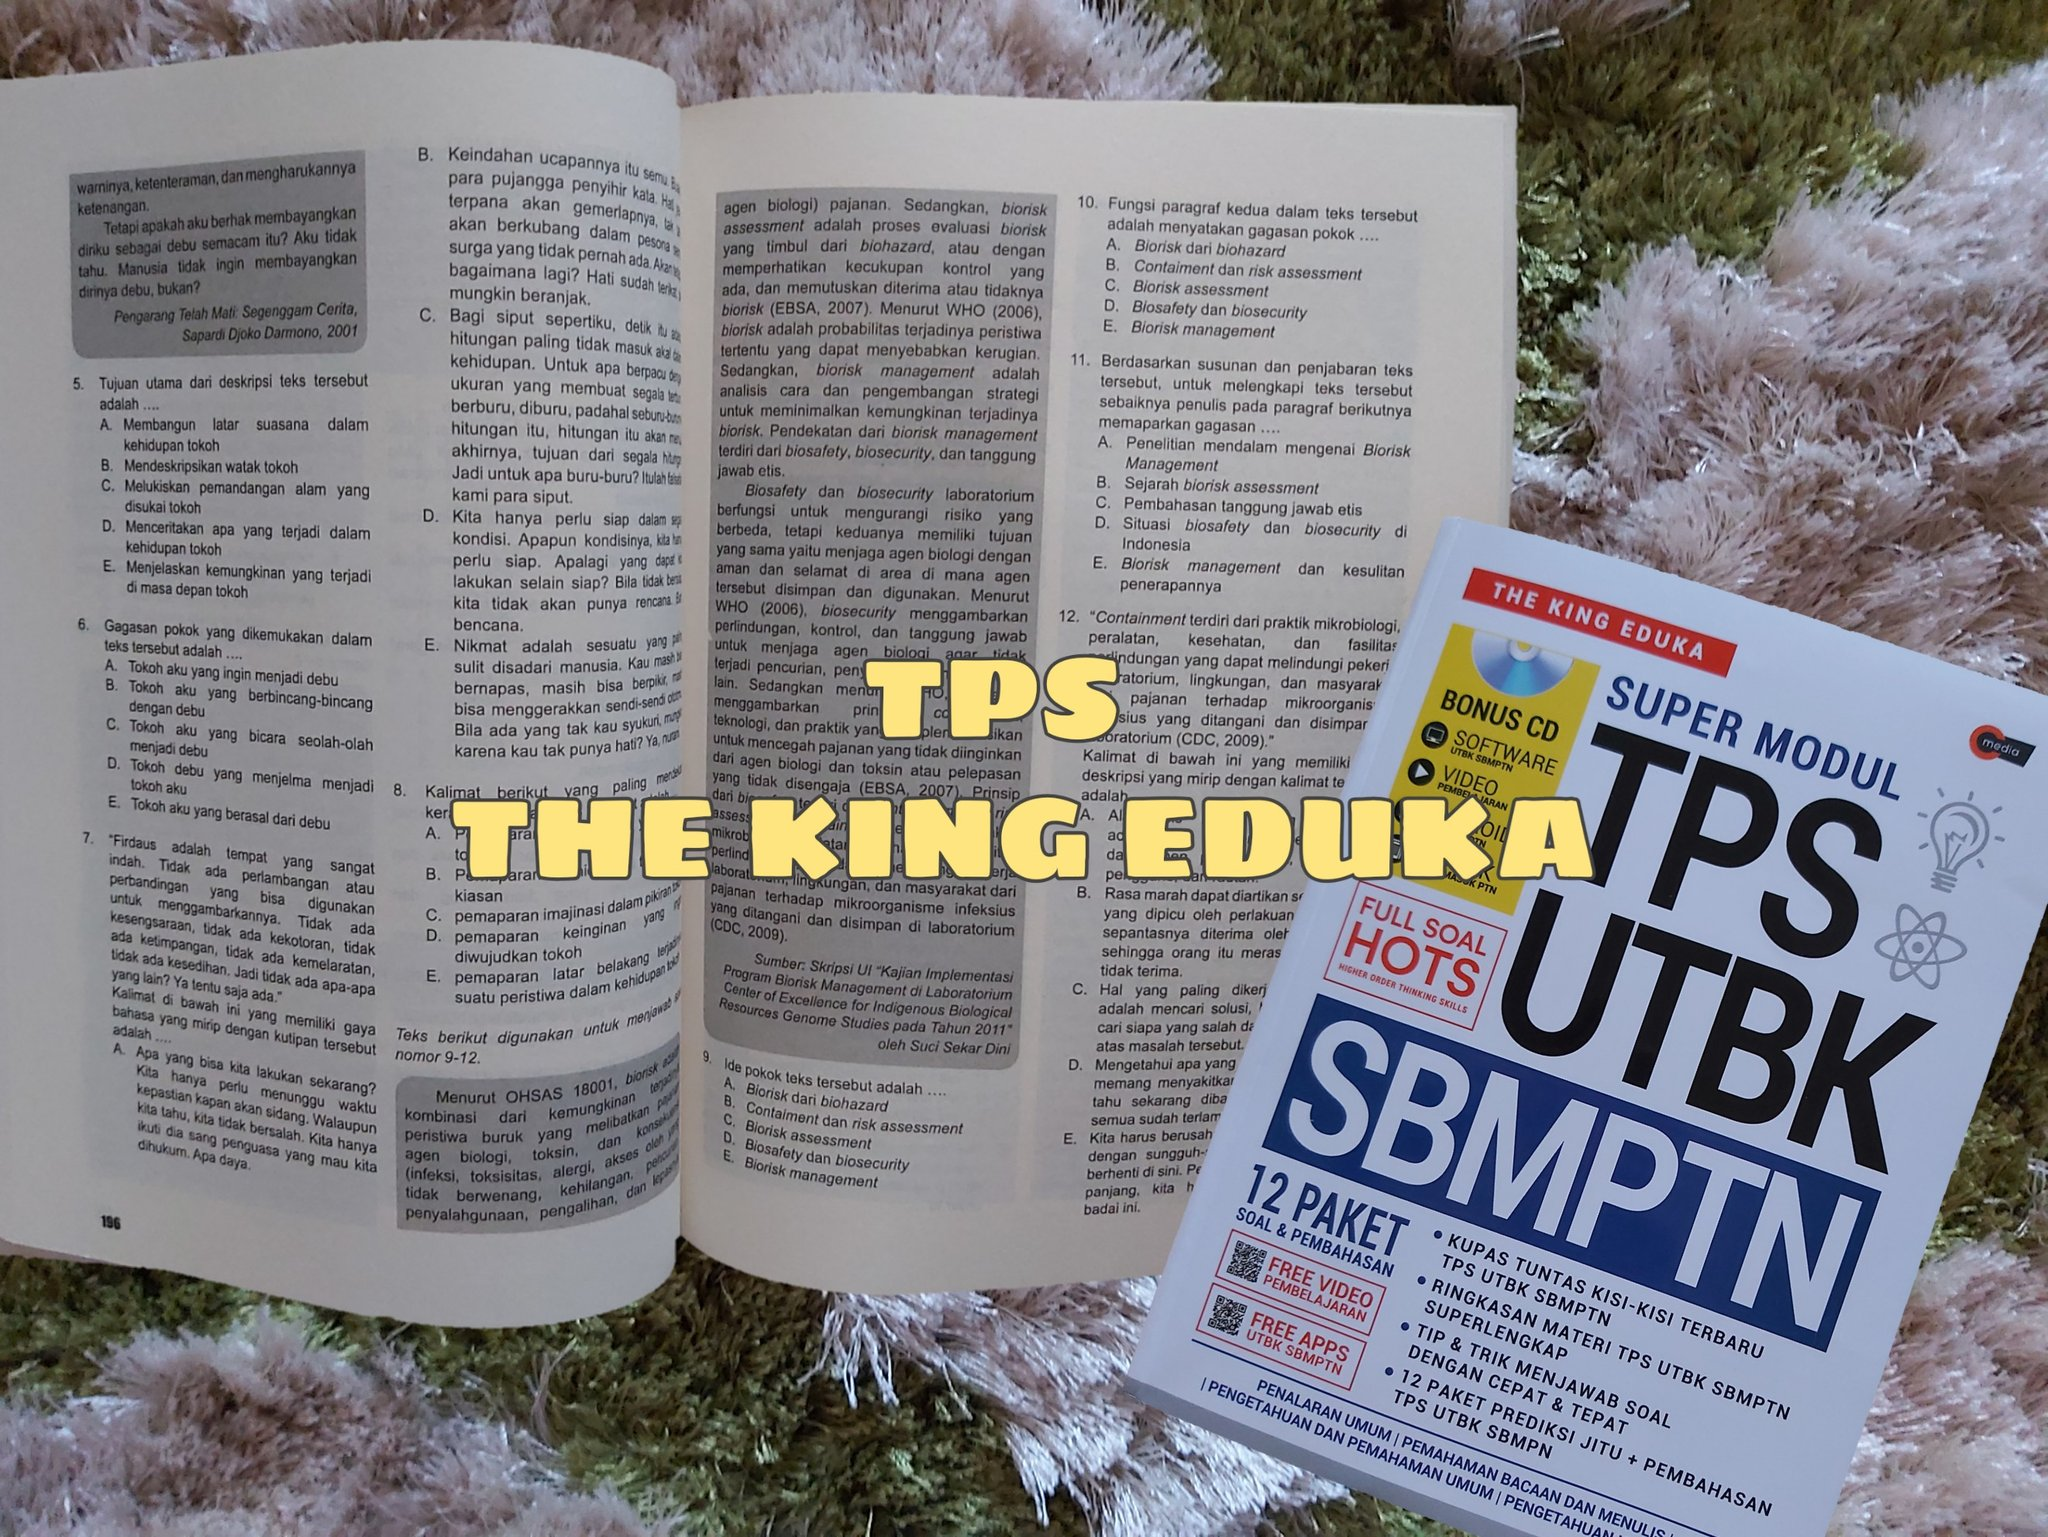 Bismillah Lolos Pilihan 1 On Twitter A Thread Review Buku Tps The King Eduka